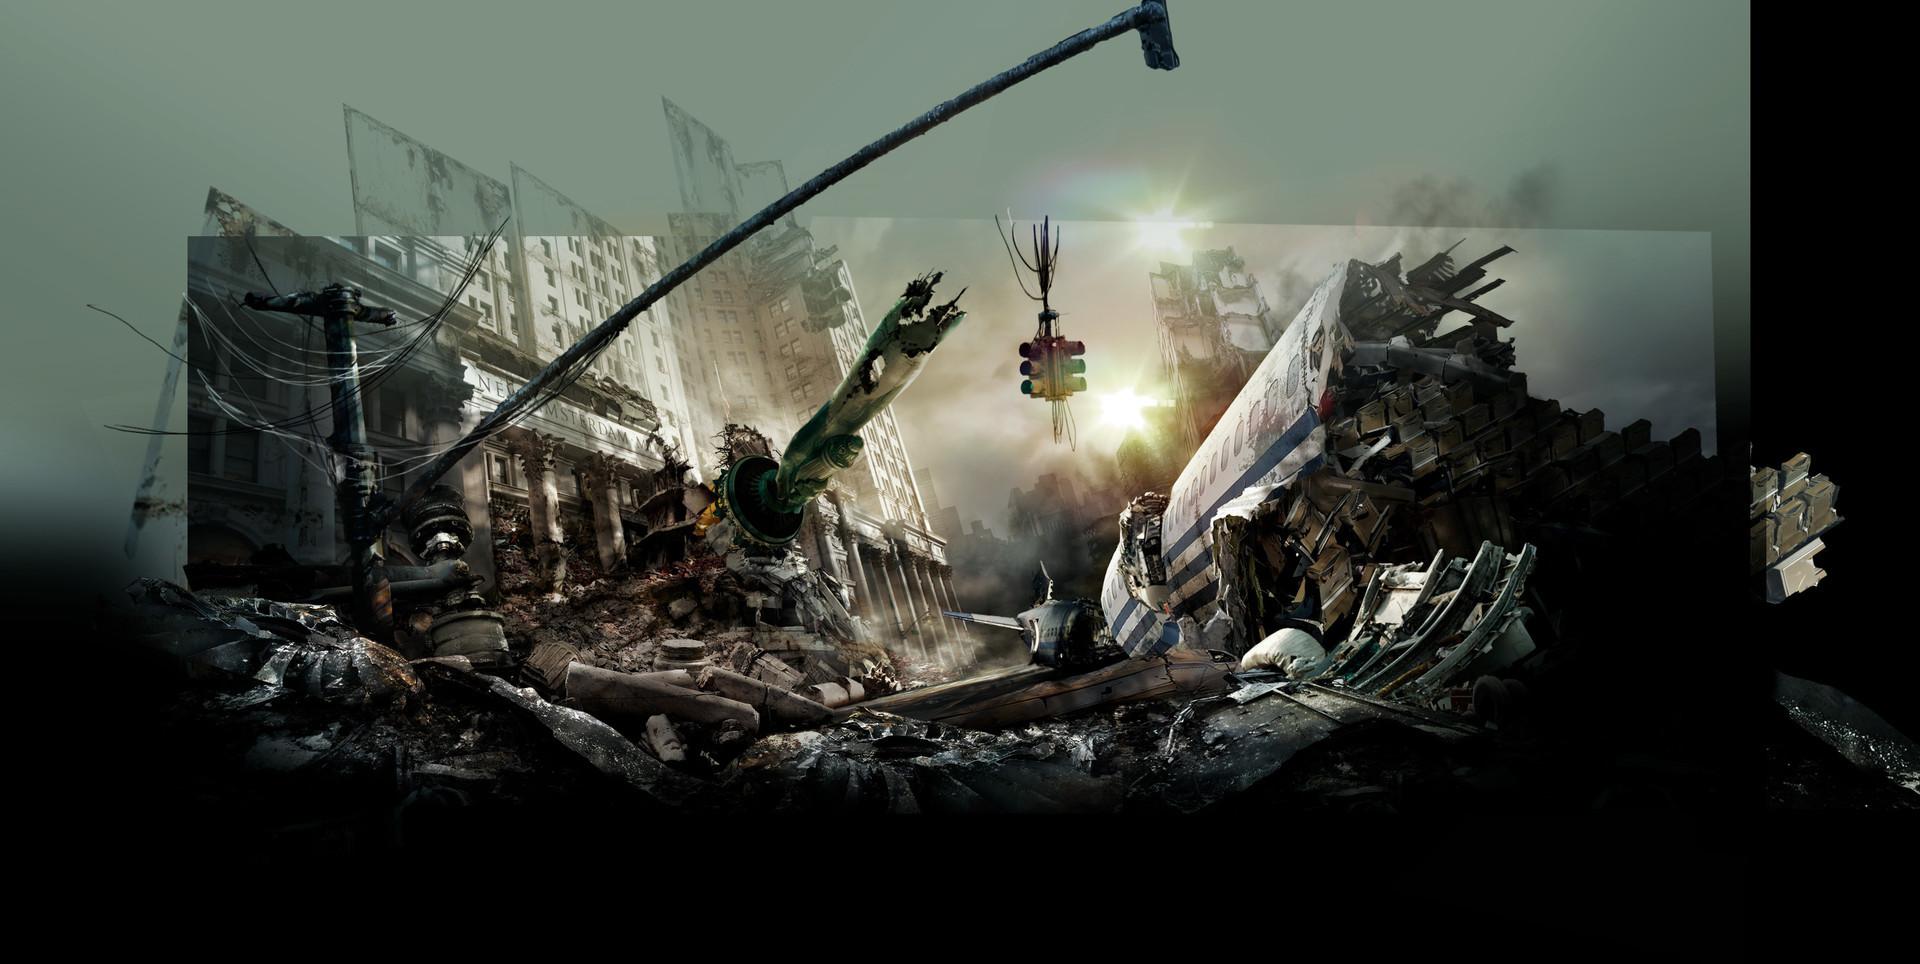 Daniele afferni daniele afferni asc asc afferni citelli mari mattepainting age of disaster fullframe